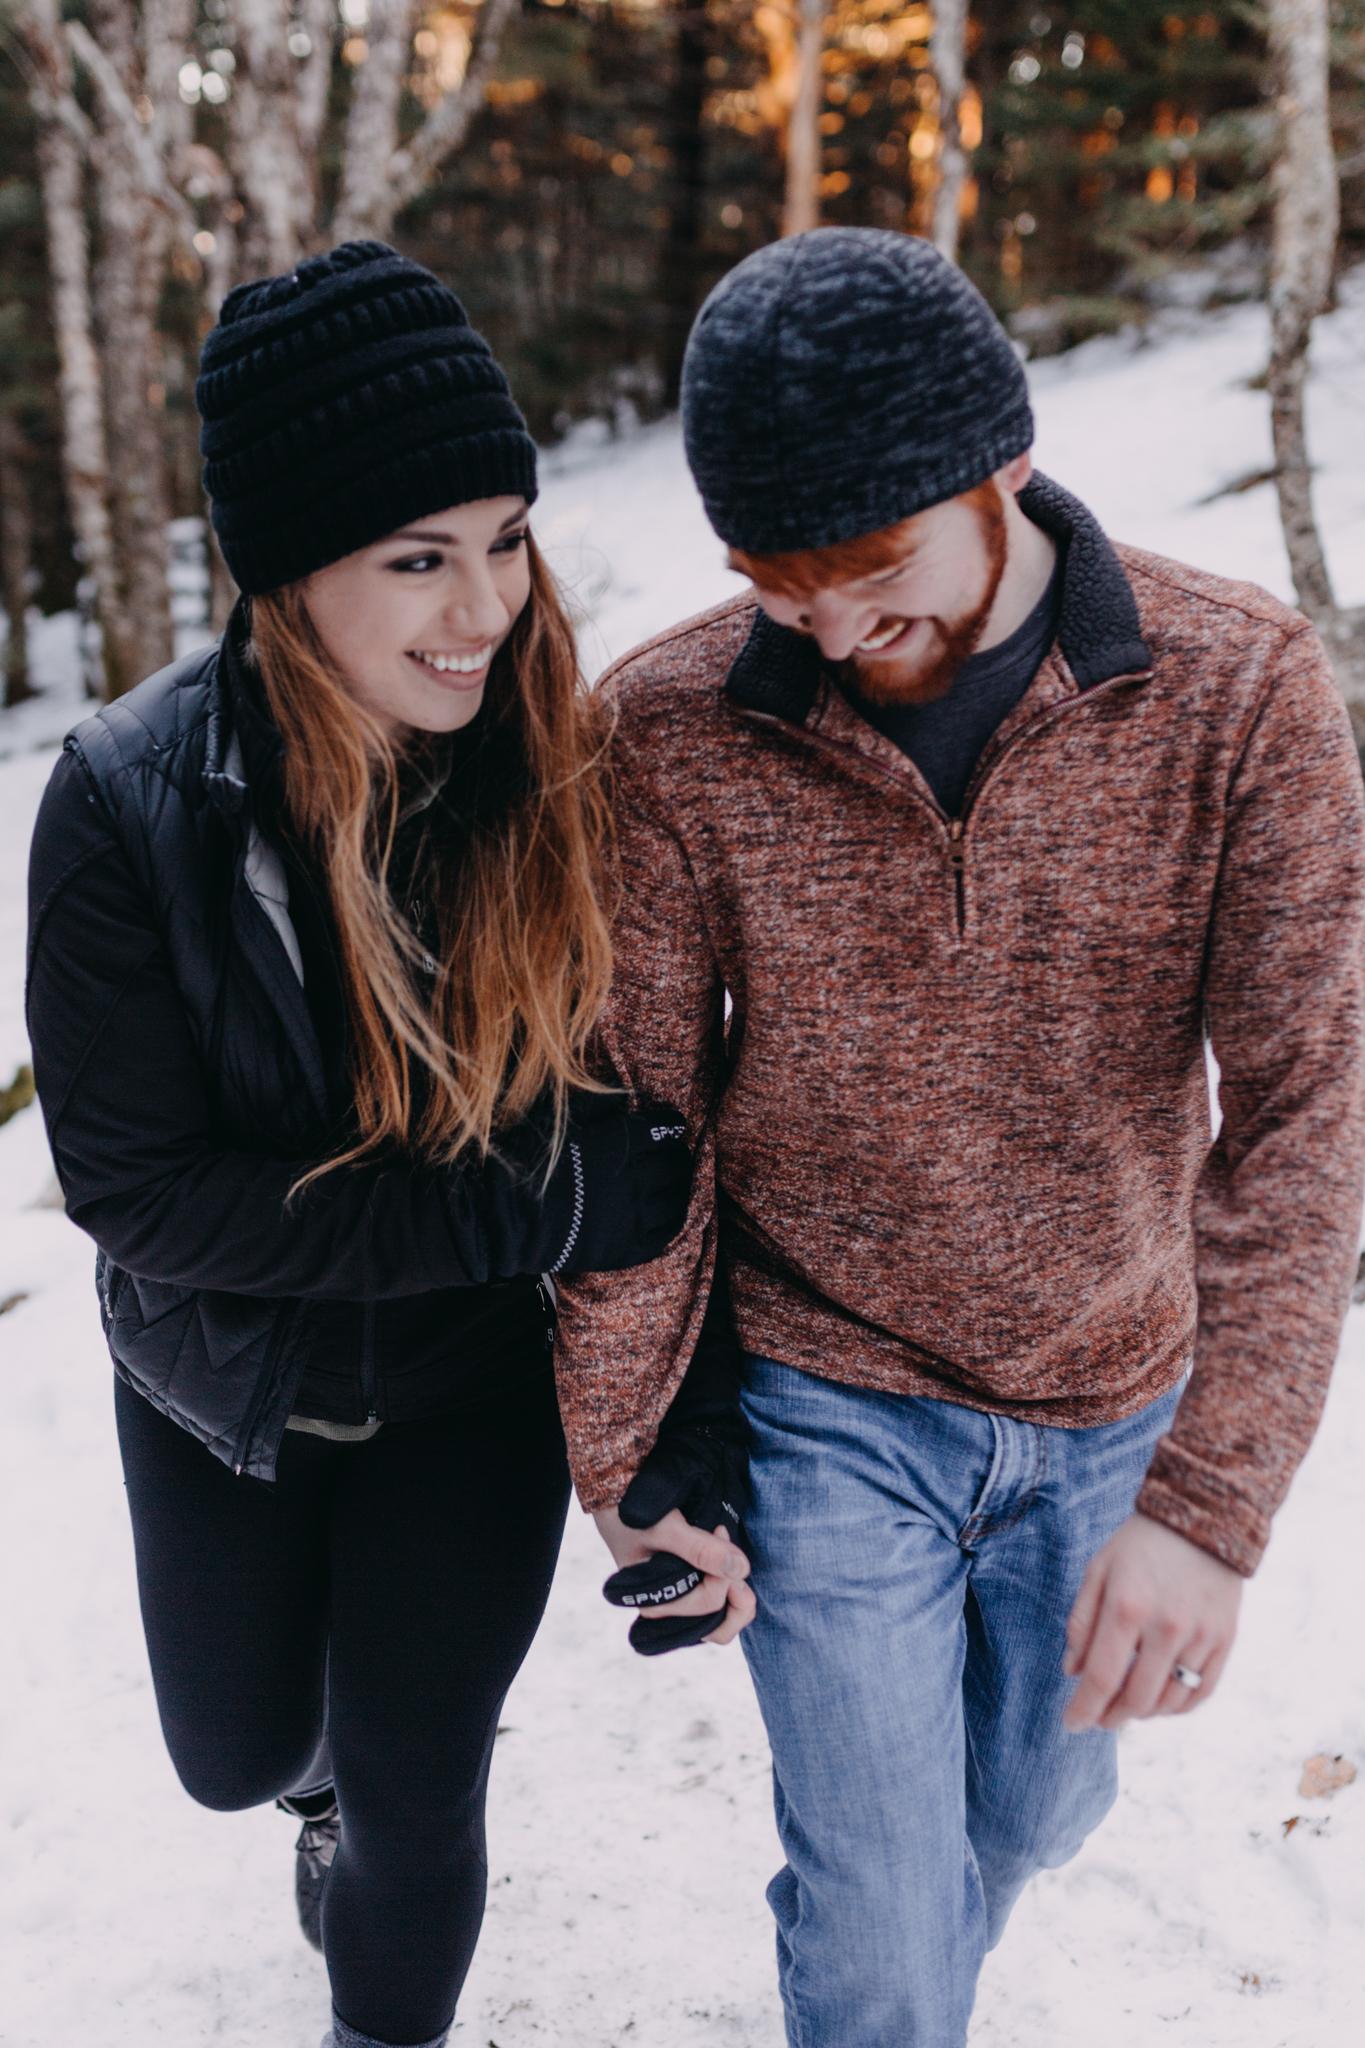 MonicaLeavellPhoto-AshleyMitch-NorthCarolina-Adventure-Engagement-Photographer-20.jpg